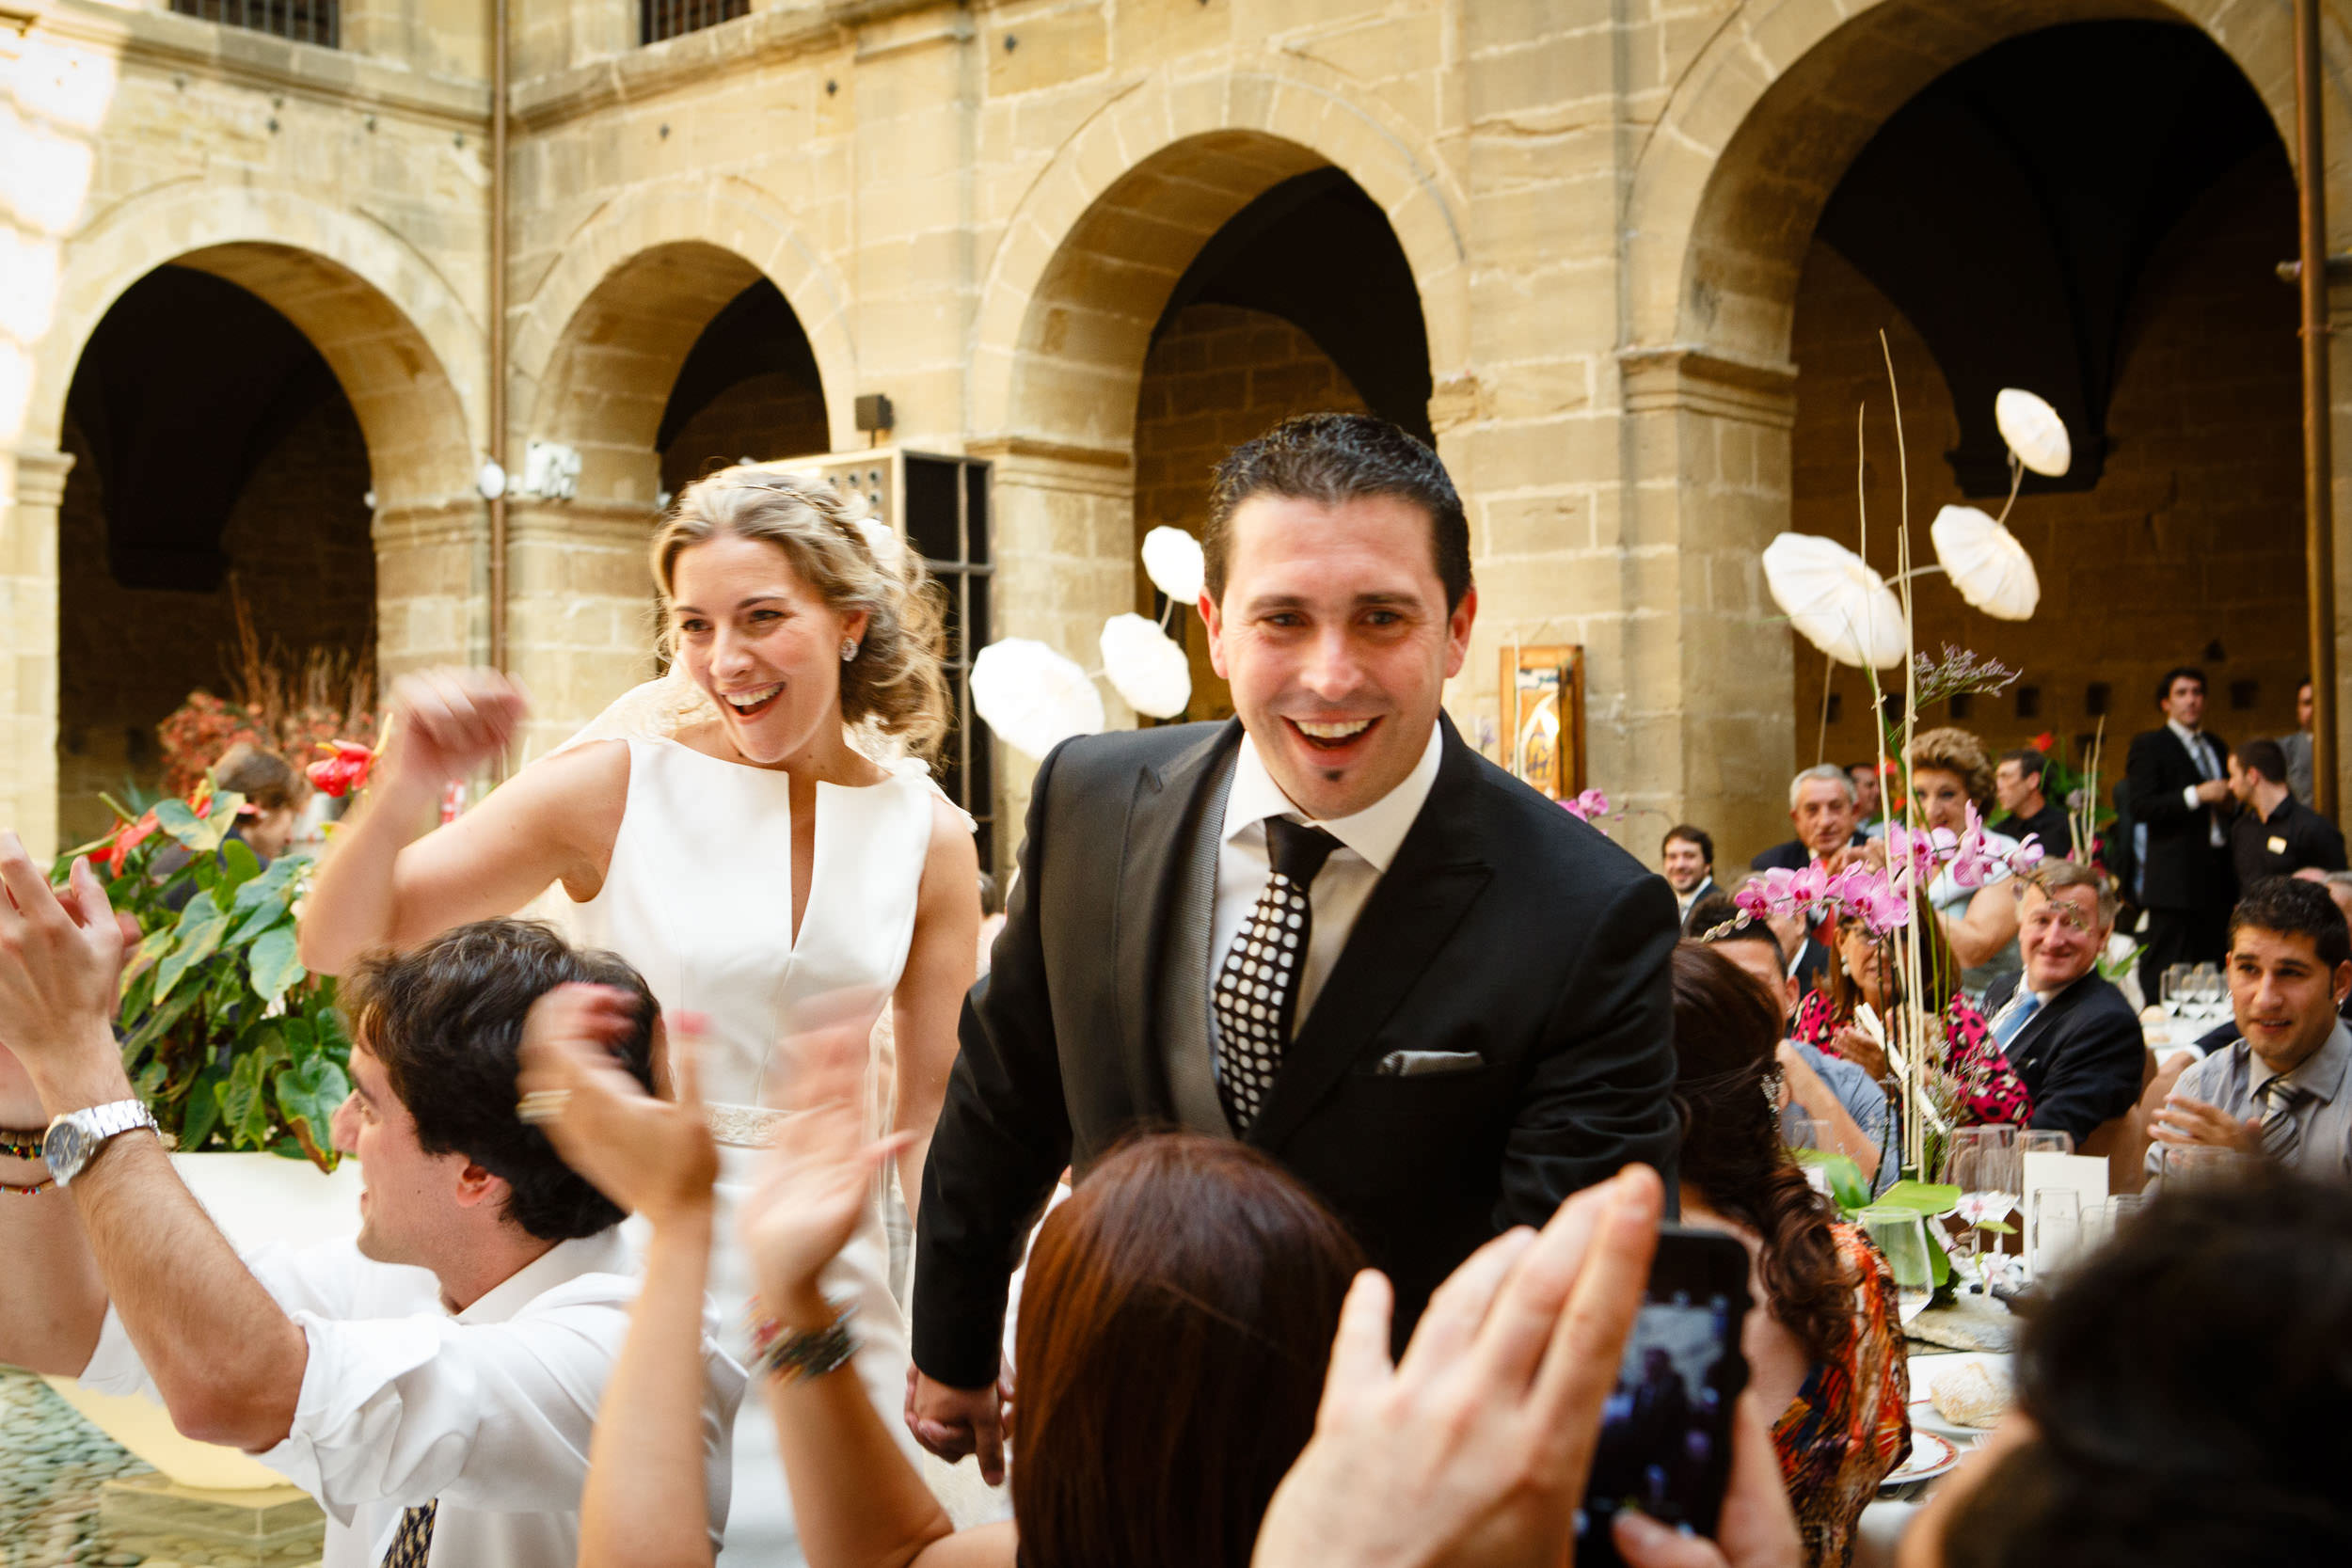 Wedding Photographer in Santo Domingo de la Calzada and Haro La Rioja Spain - James Sturcke  Photographer | sturcke.org_012.jpg